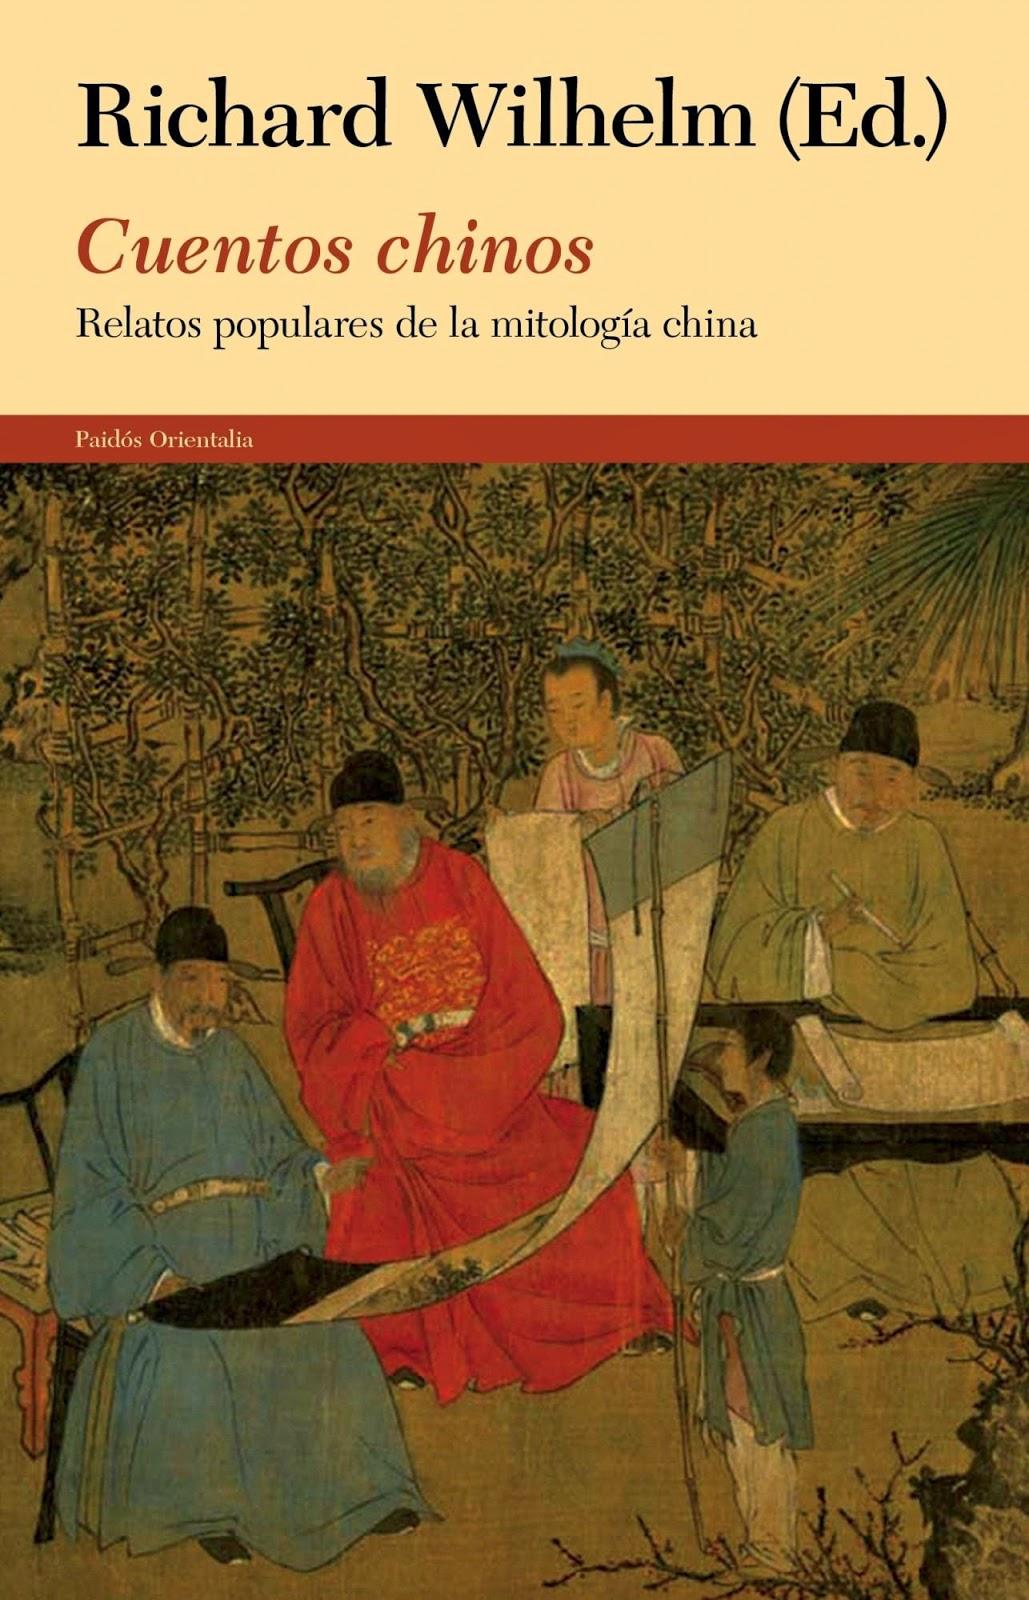 Descarga: Richard Wilhelm - Cuentos chinos